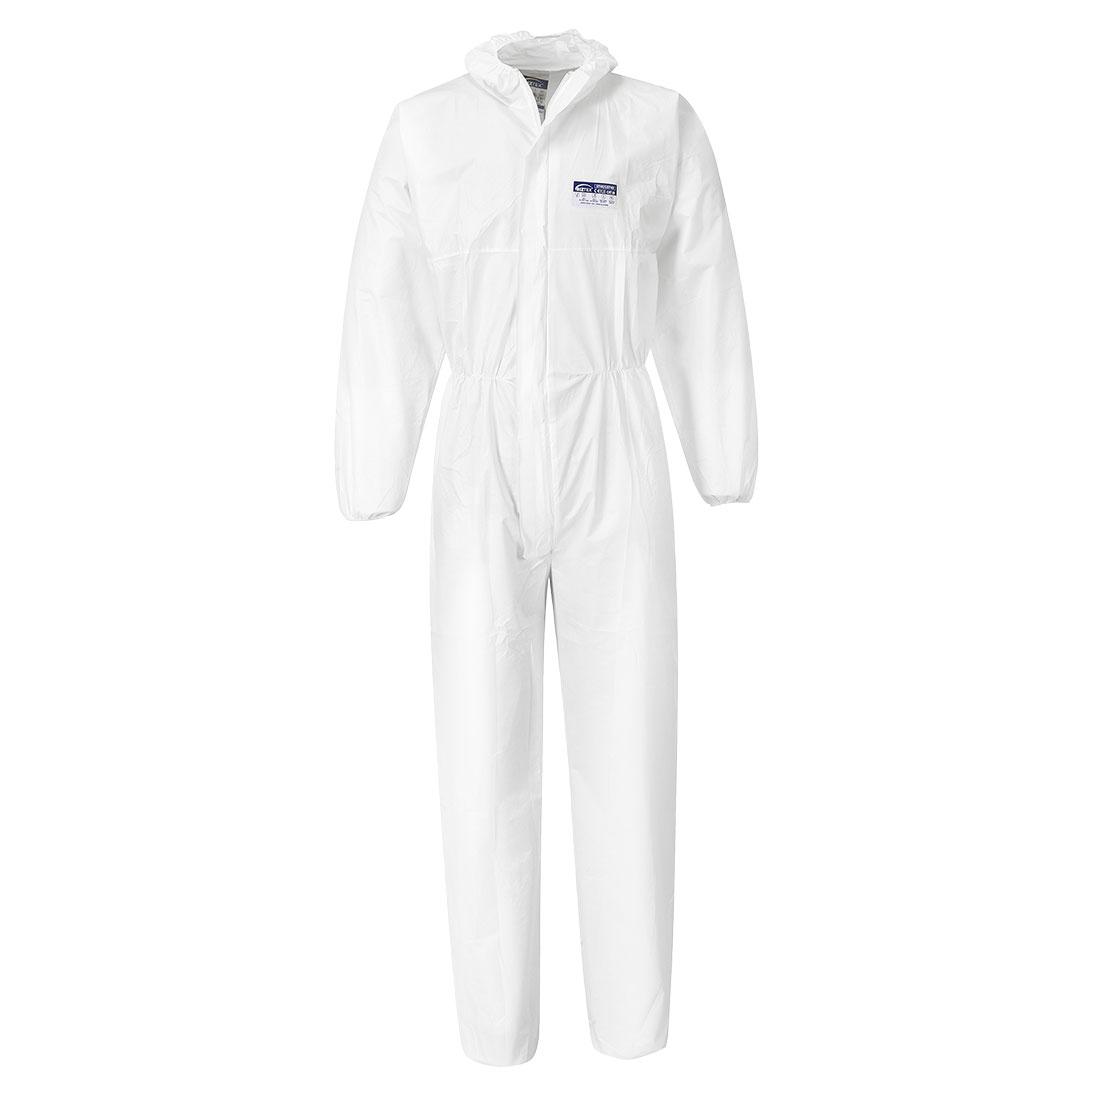 Workwear, Hazard Protection